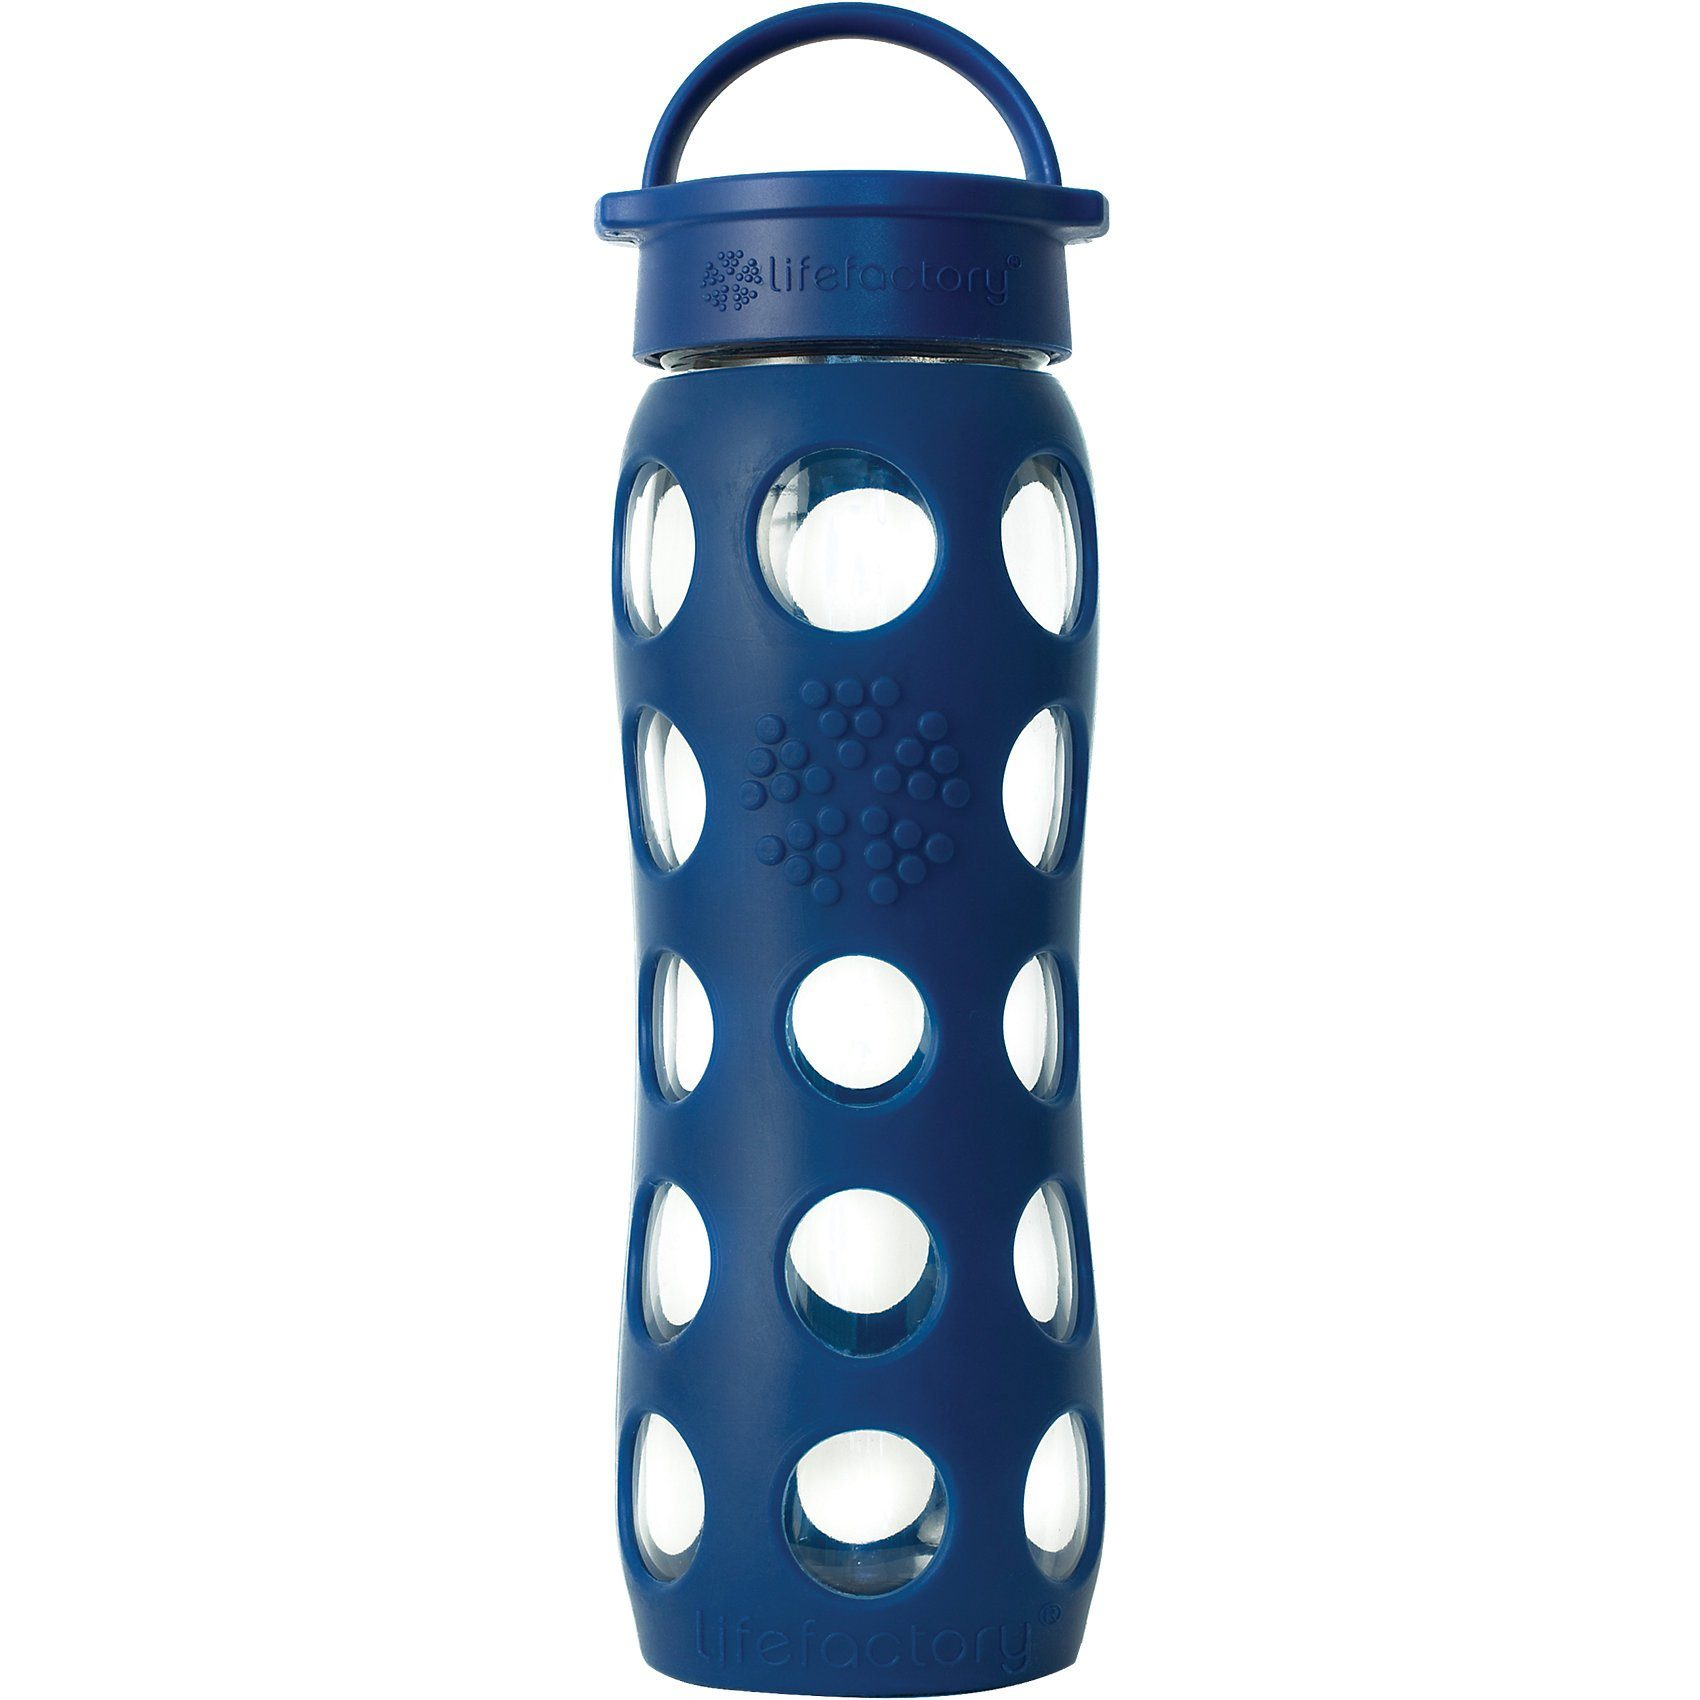 Lifefactory Trinkflasche Glas midnight blue, 650 ml